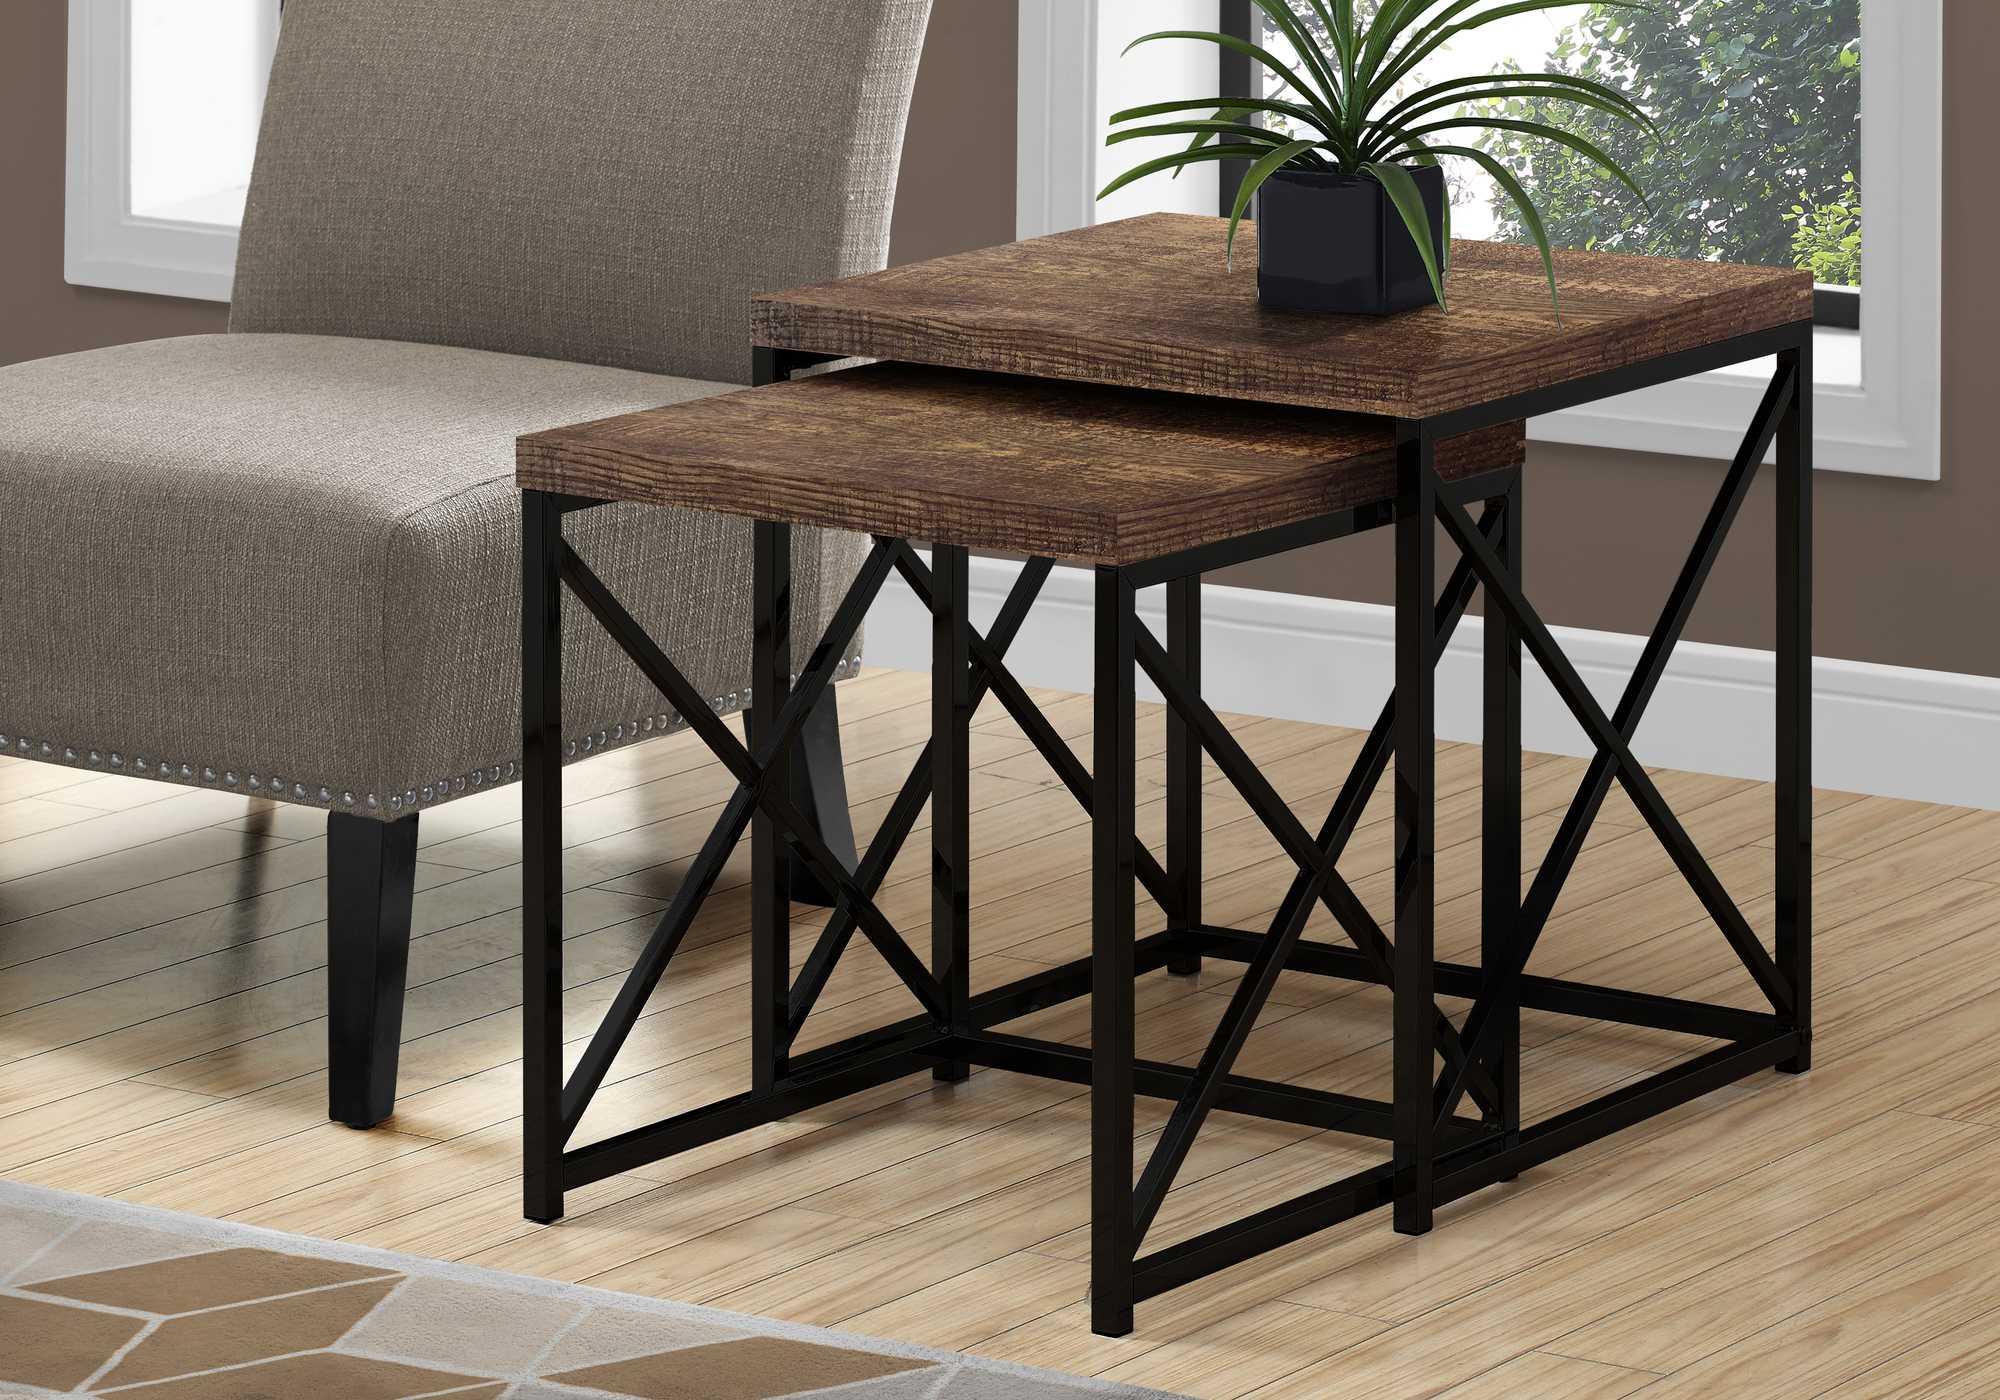 "37.25"" x 37.25"" x 40.5"" Brown Black Particle Board Metal  2pcs Nesting Table Set"